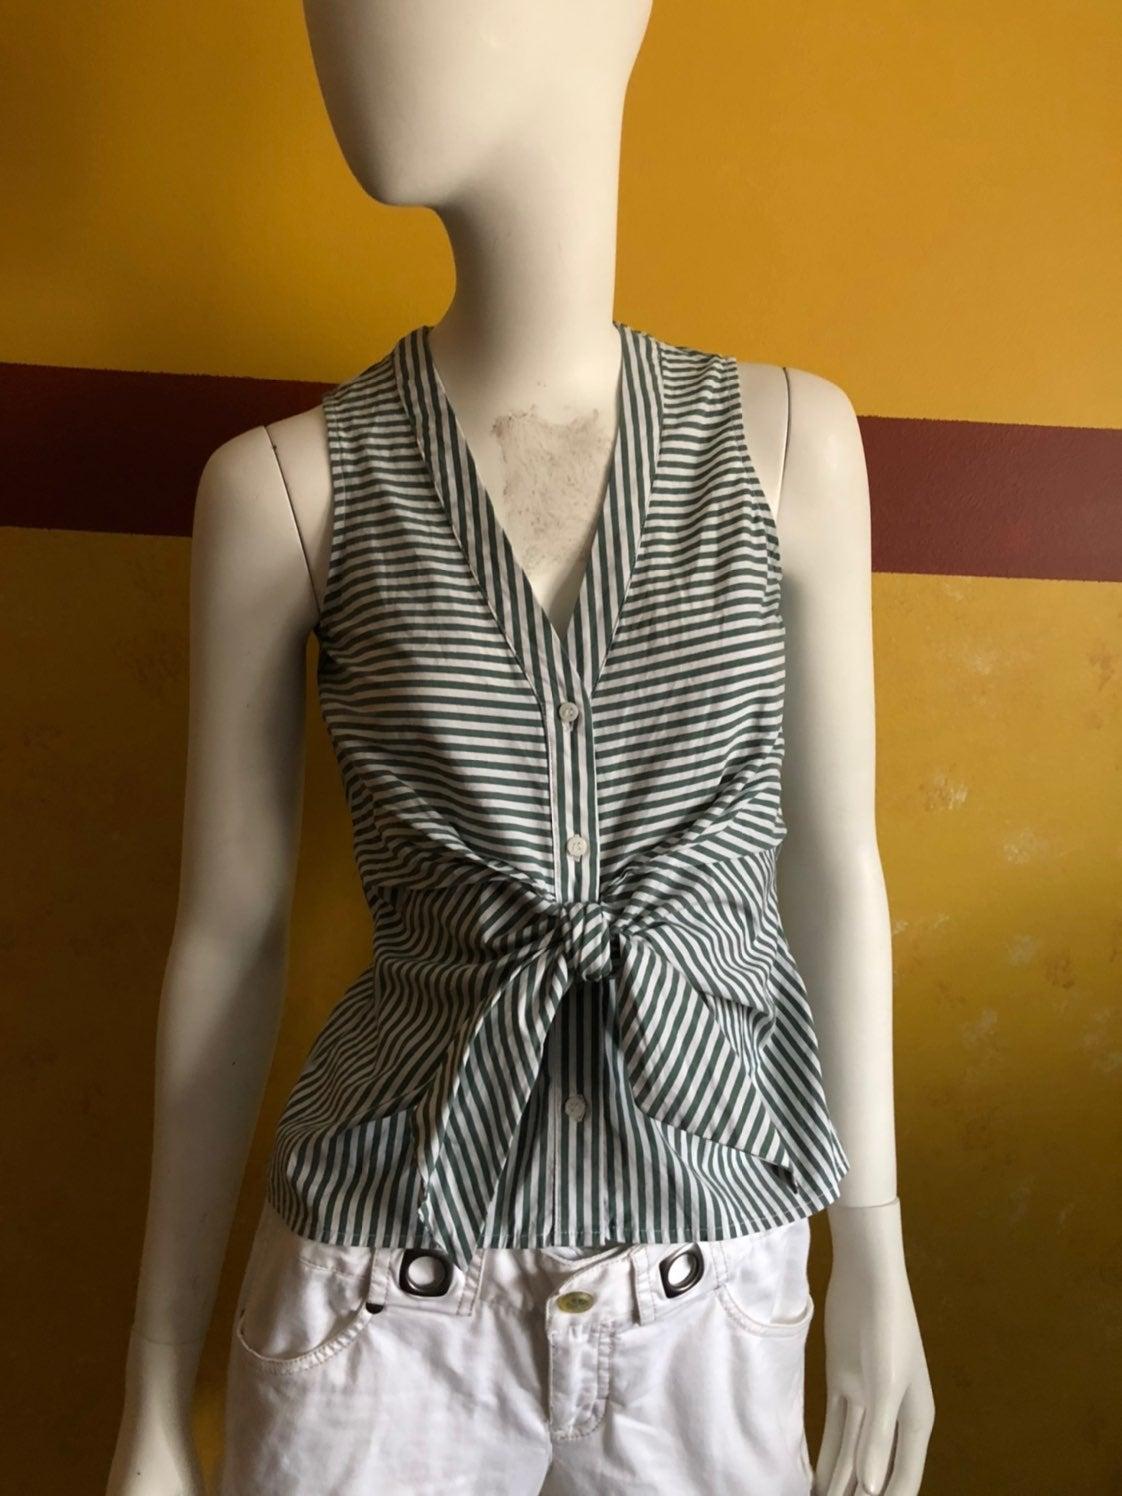 Bar llI green & white striped shirt